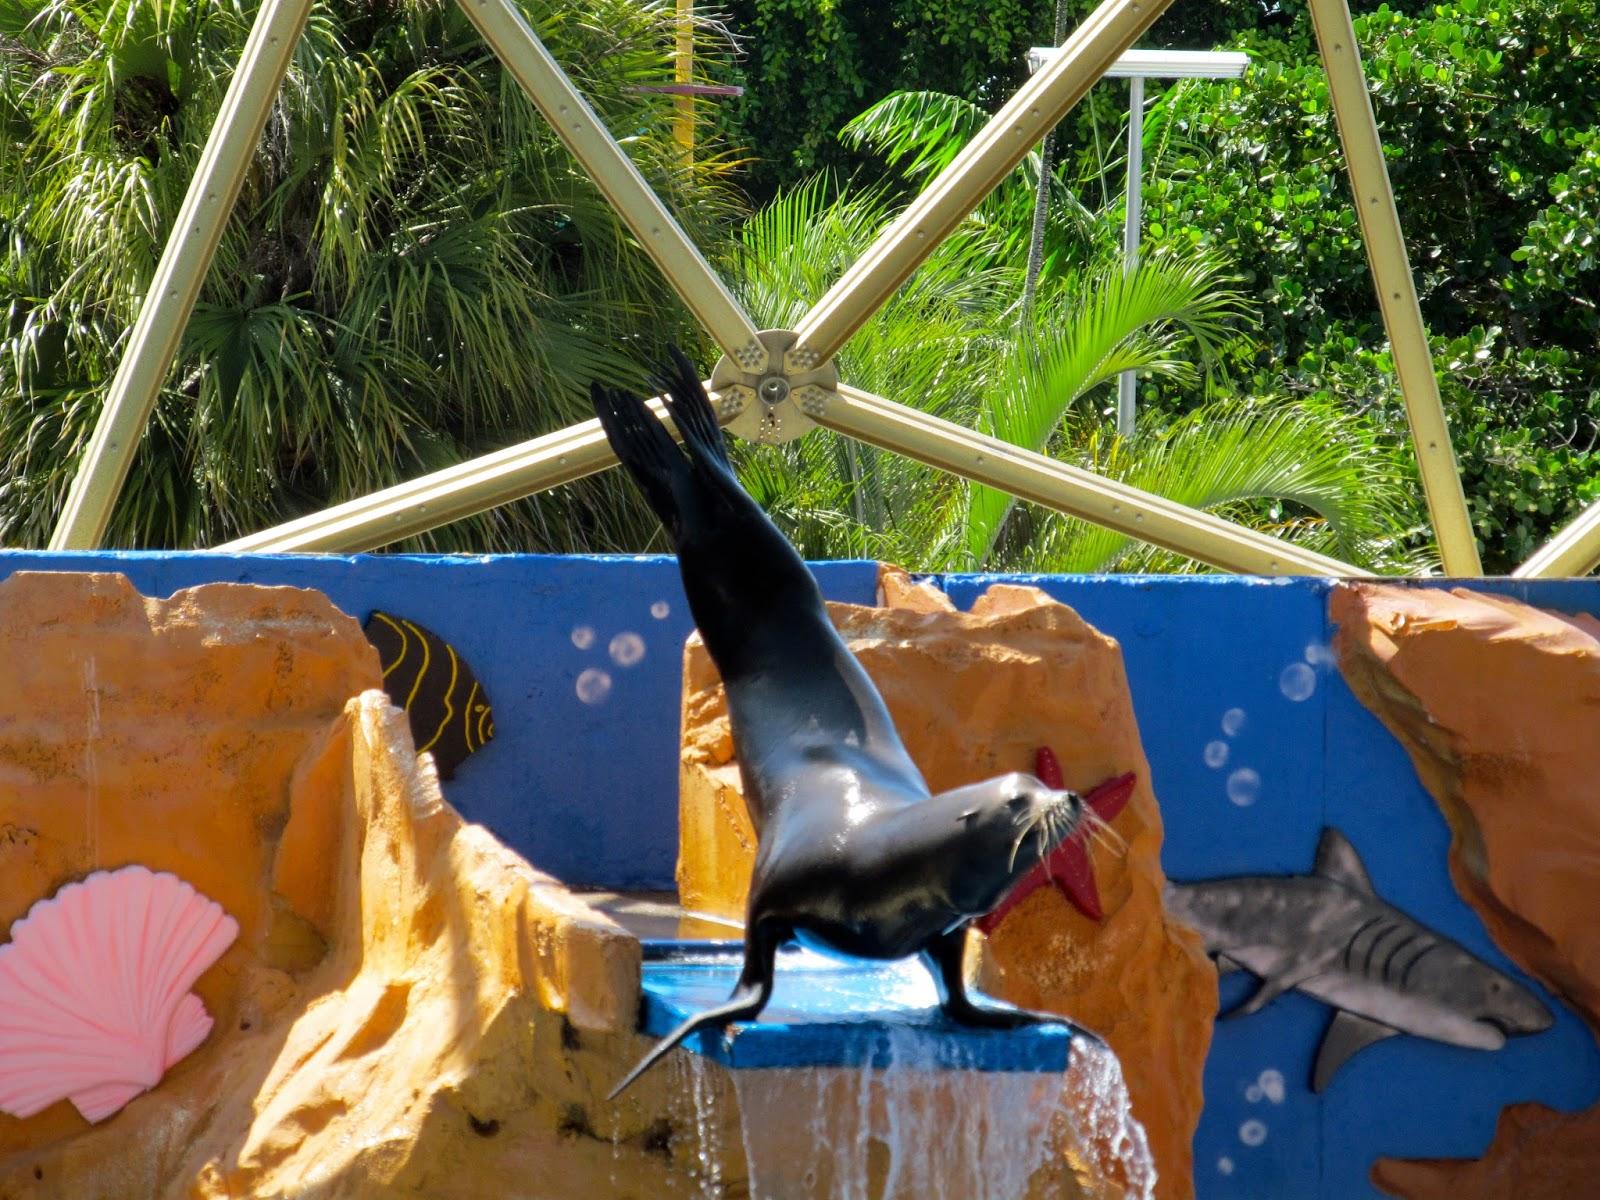 Sea Lion Sow Miami Seaquarium, FL - ouroutdoortravels.blogspot.com